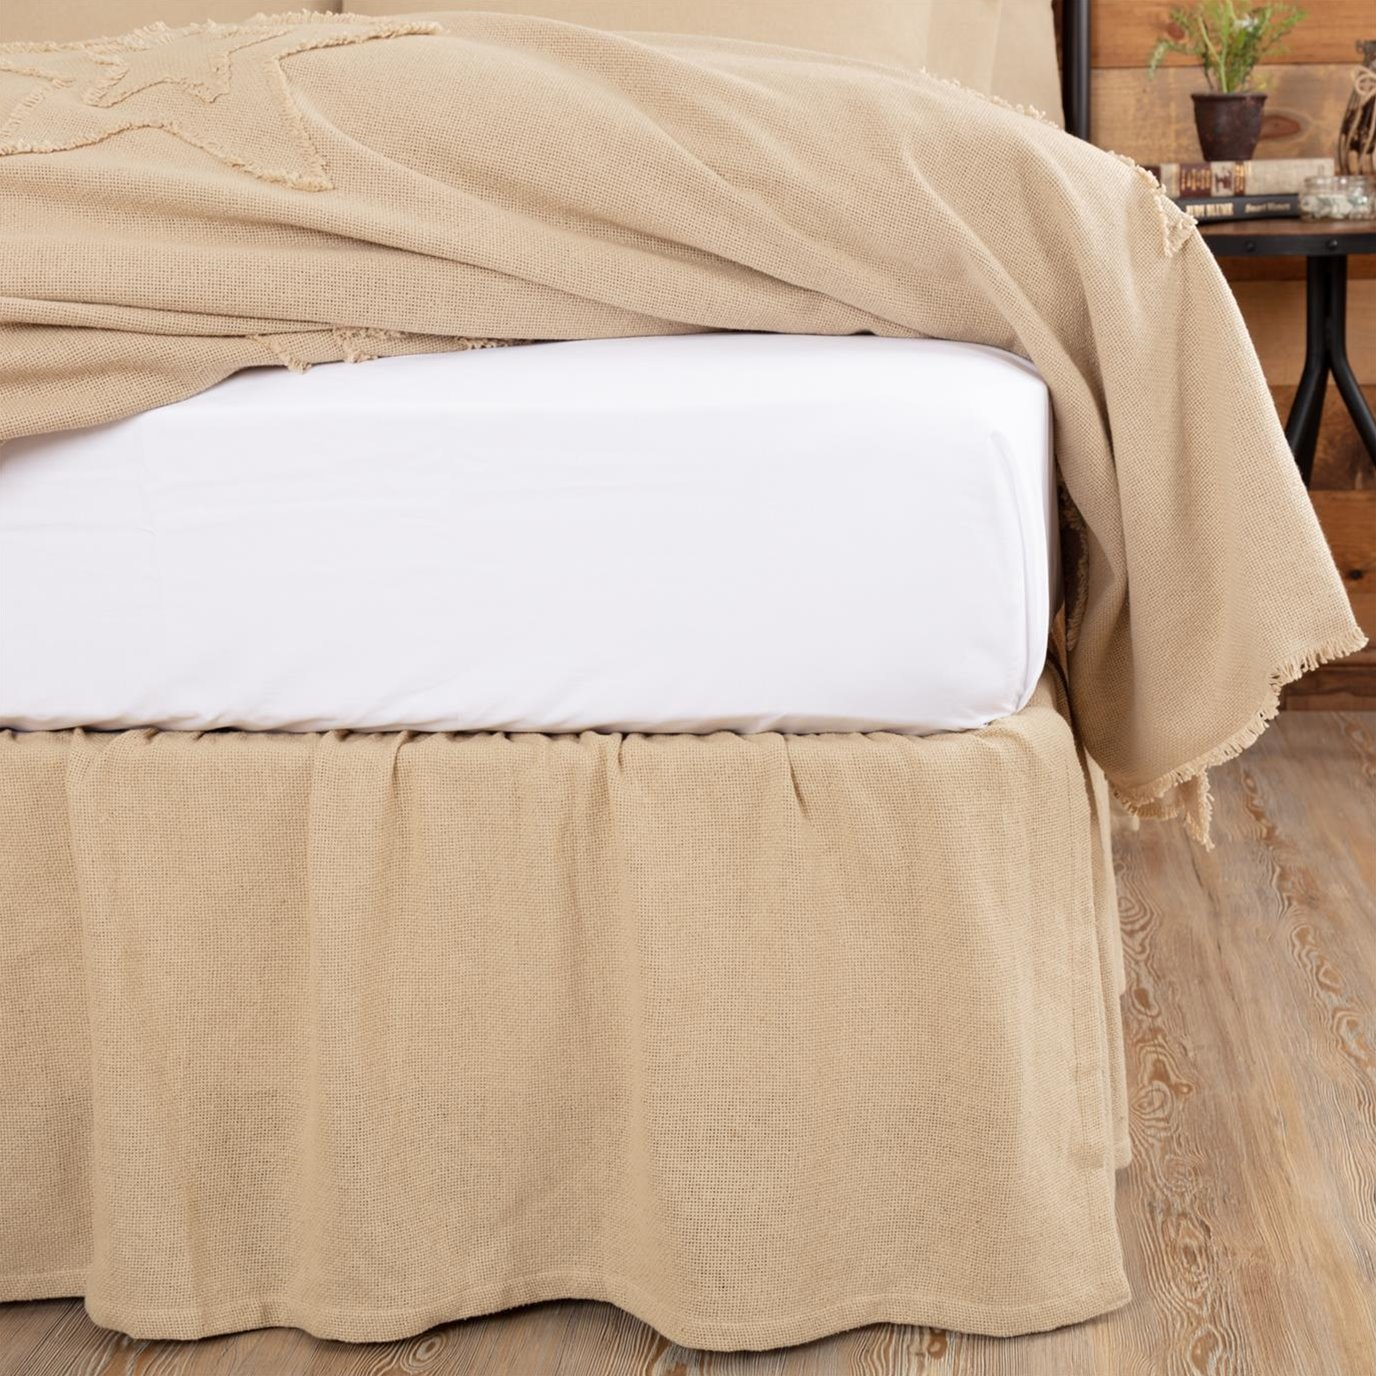 Burlap Vintage Ruffled Twin Bed Skirt 39x76x16